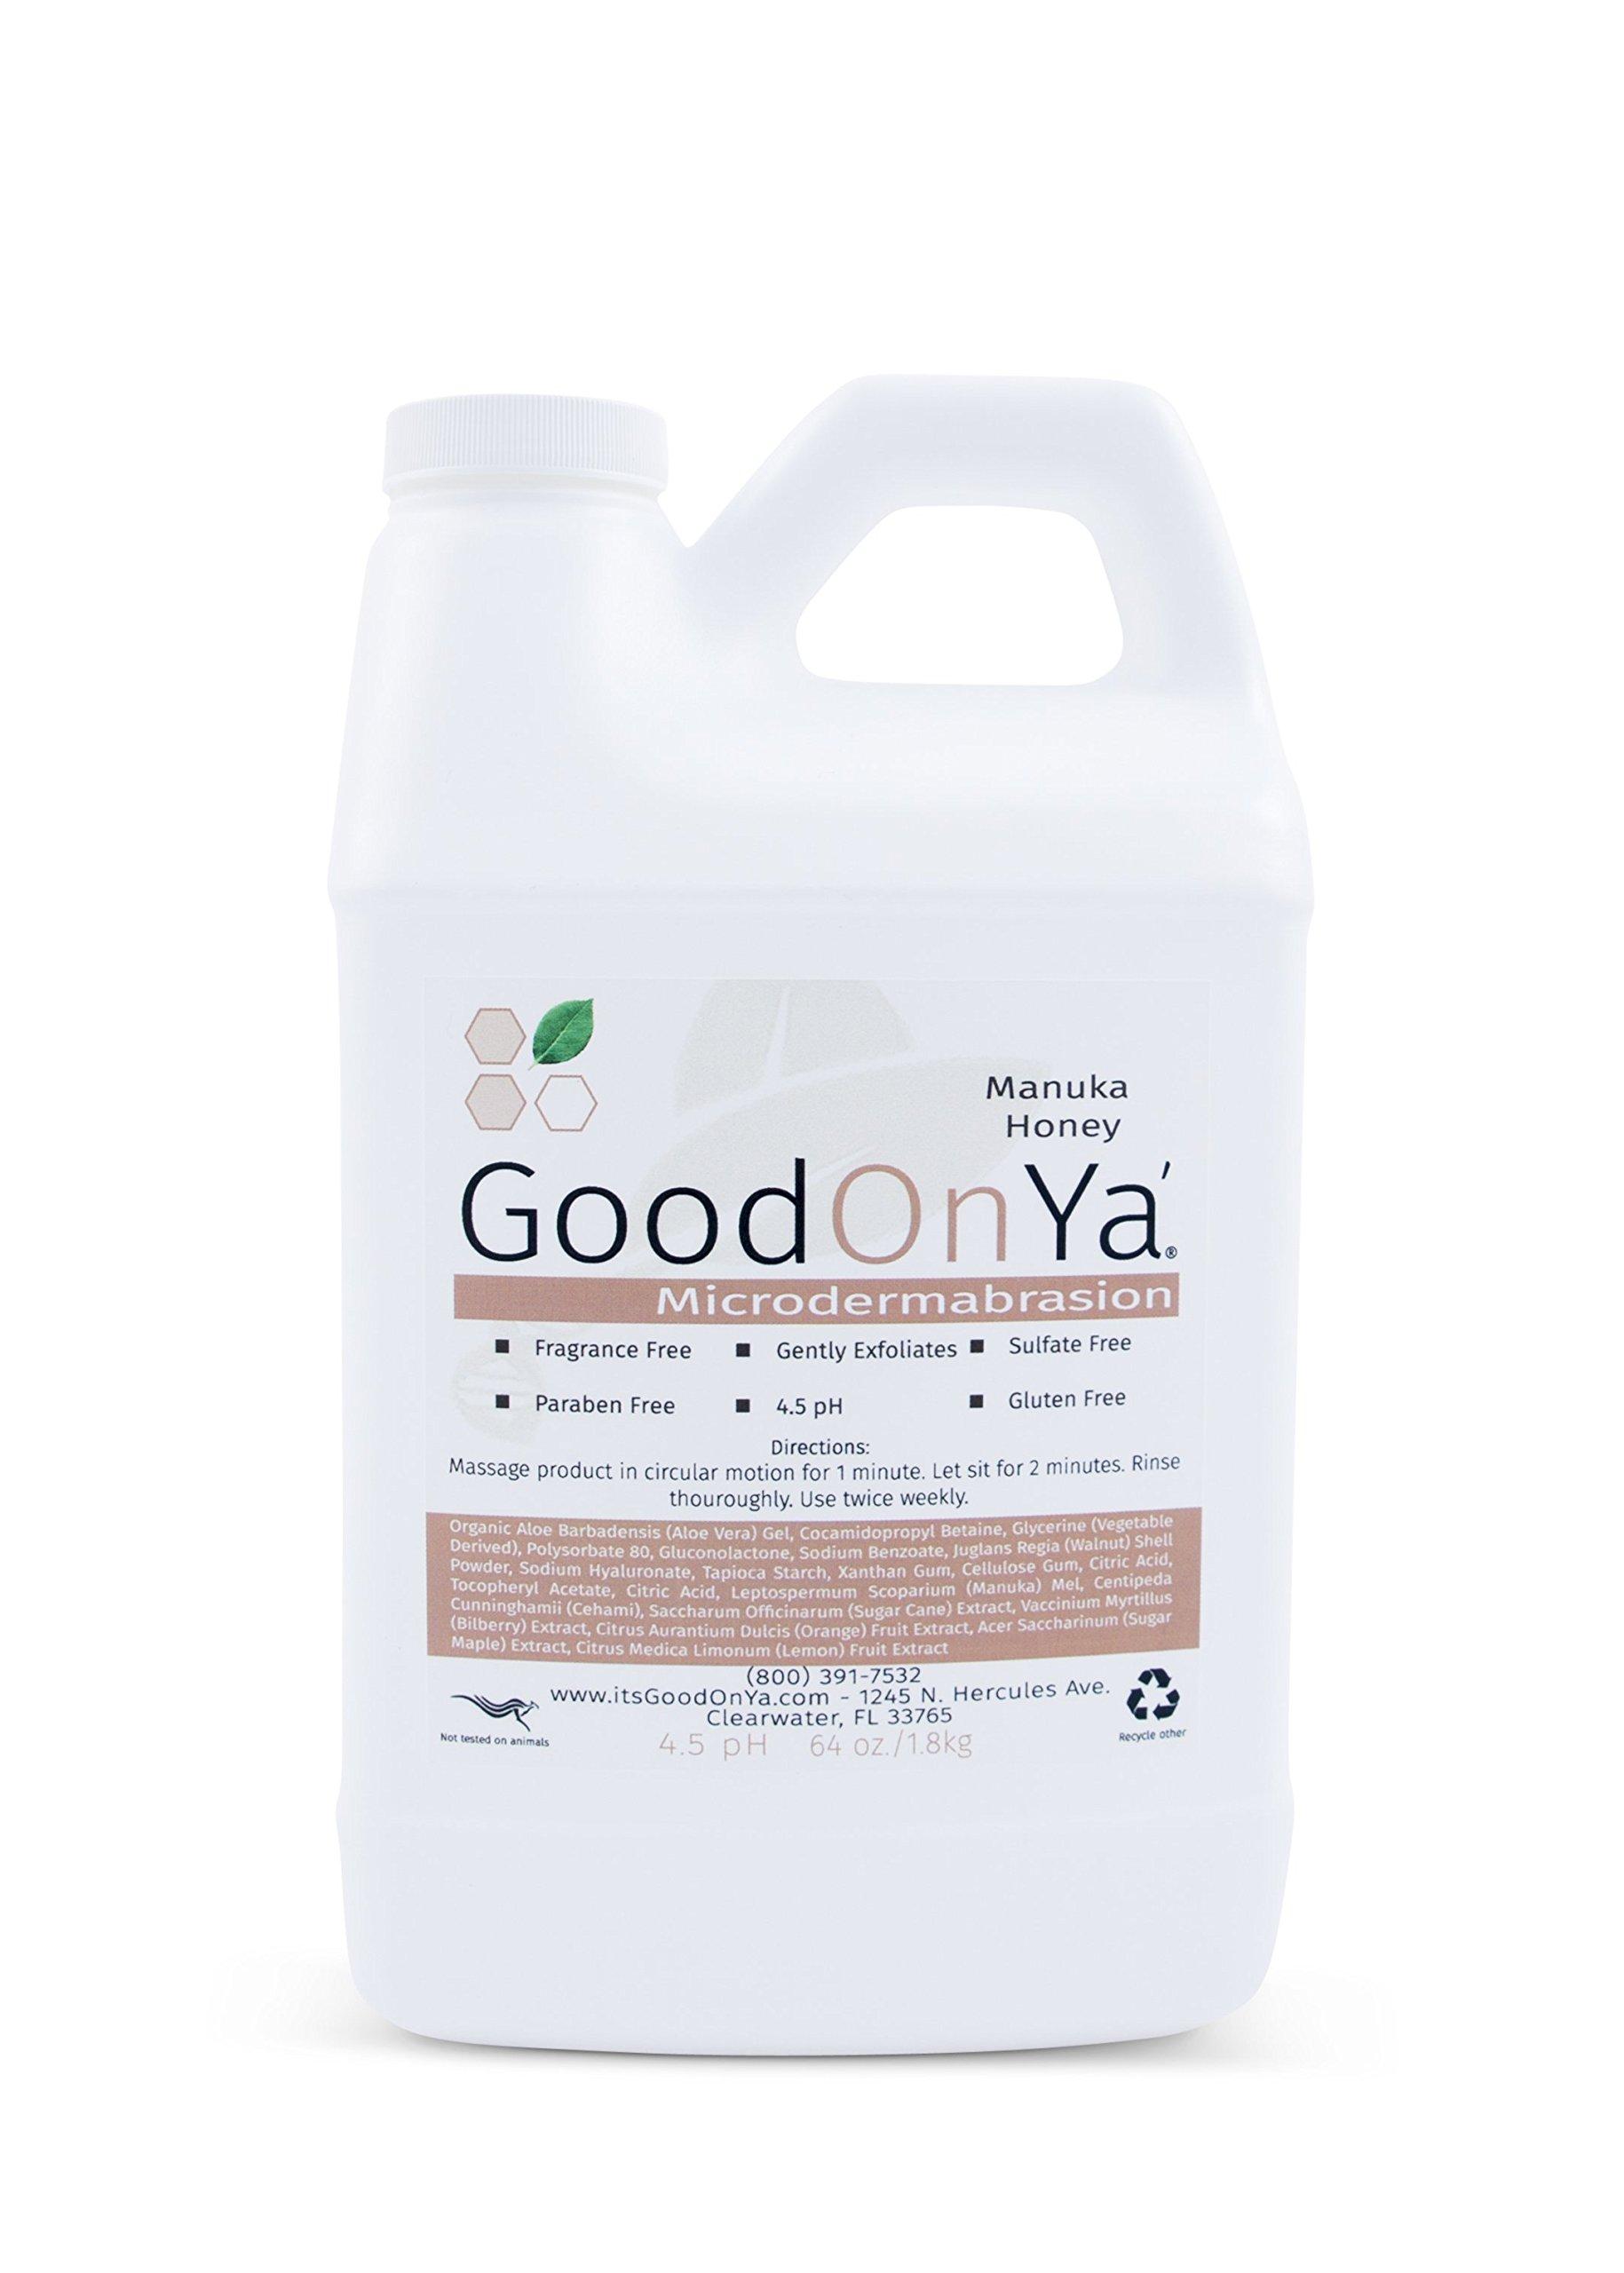 Exfoliating Scrub Microdermabrasion Cleanser with Manuka Honey by GoodOnYa Natural & Organic. Fragrance Free, Paraben Free. Keep Away Blackheads (64 oz)